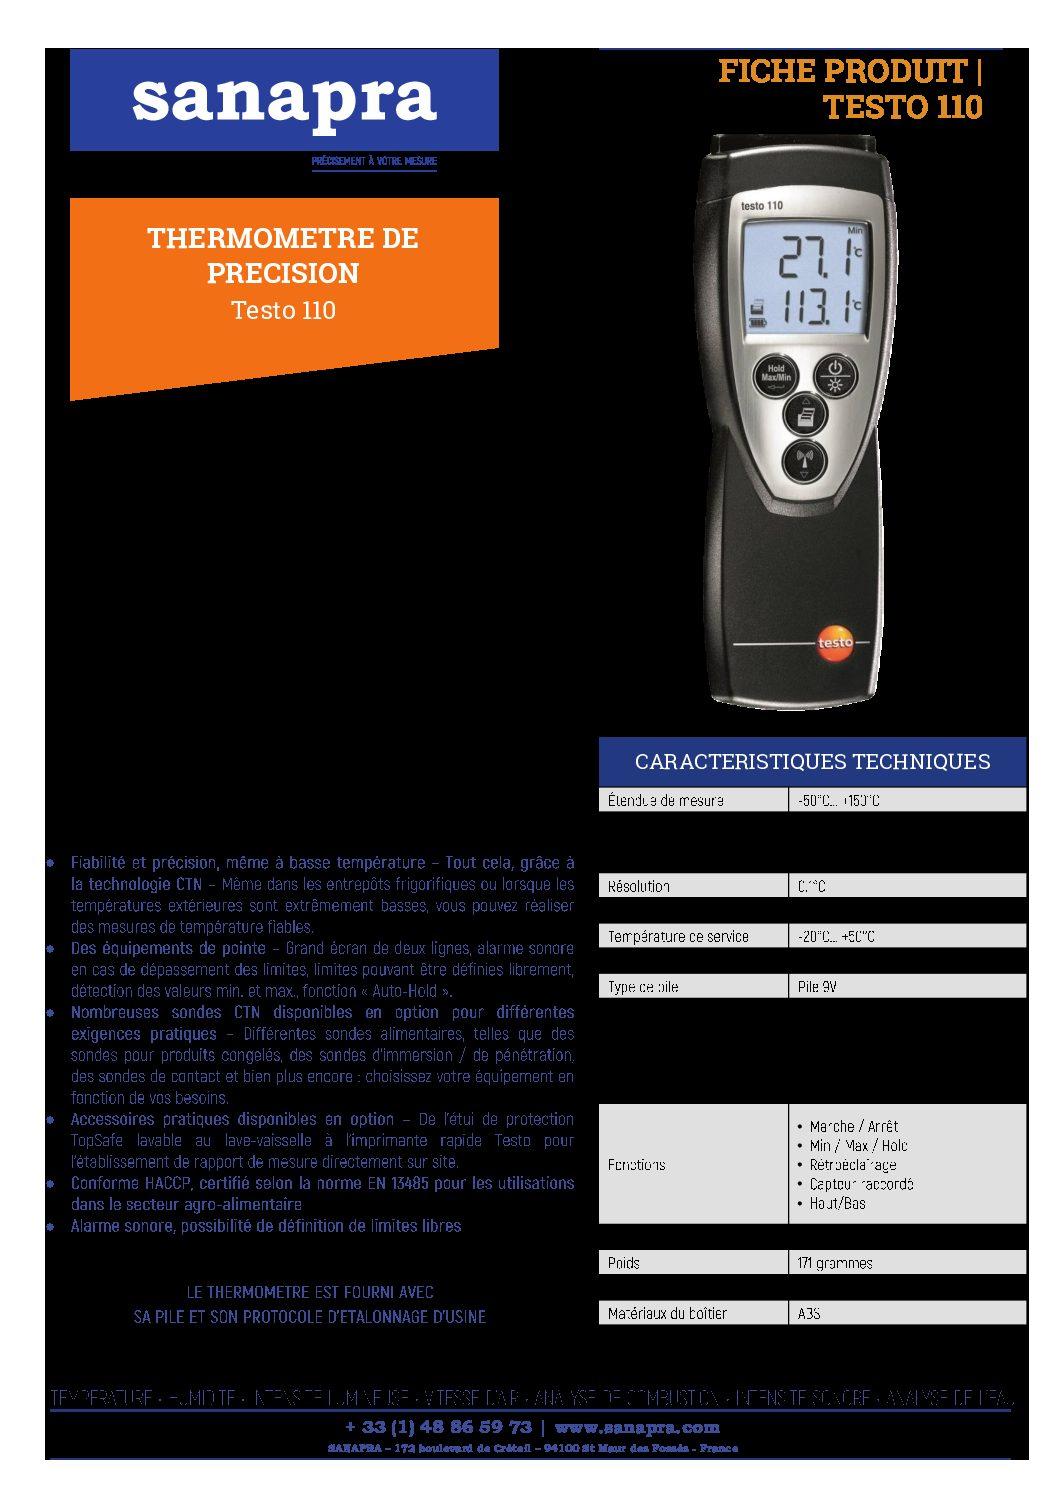 FICHE PRODUIT 033 – TESTO 110